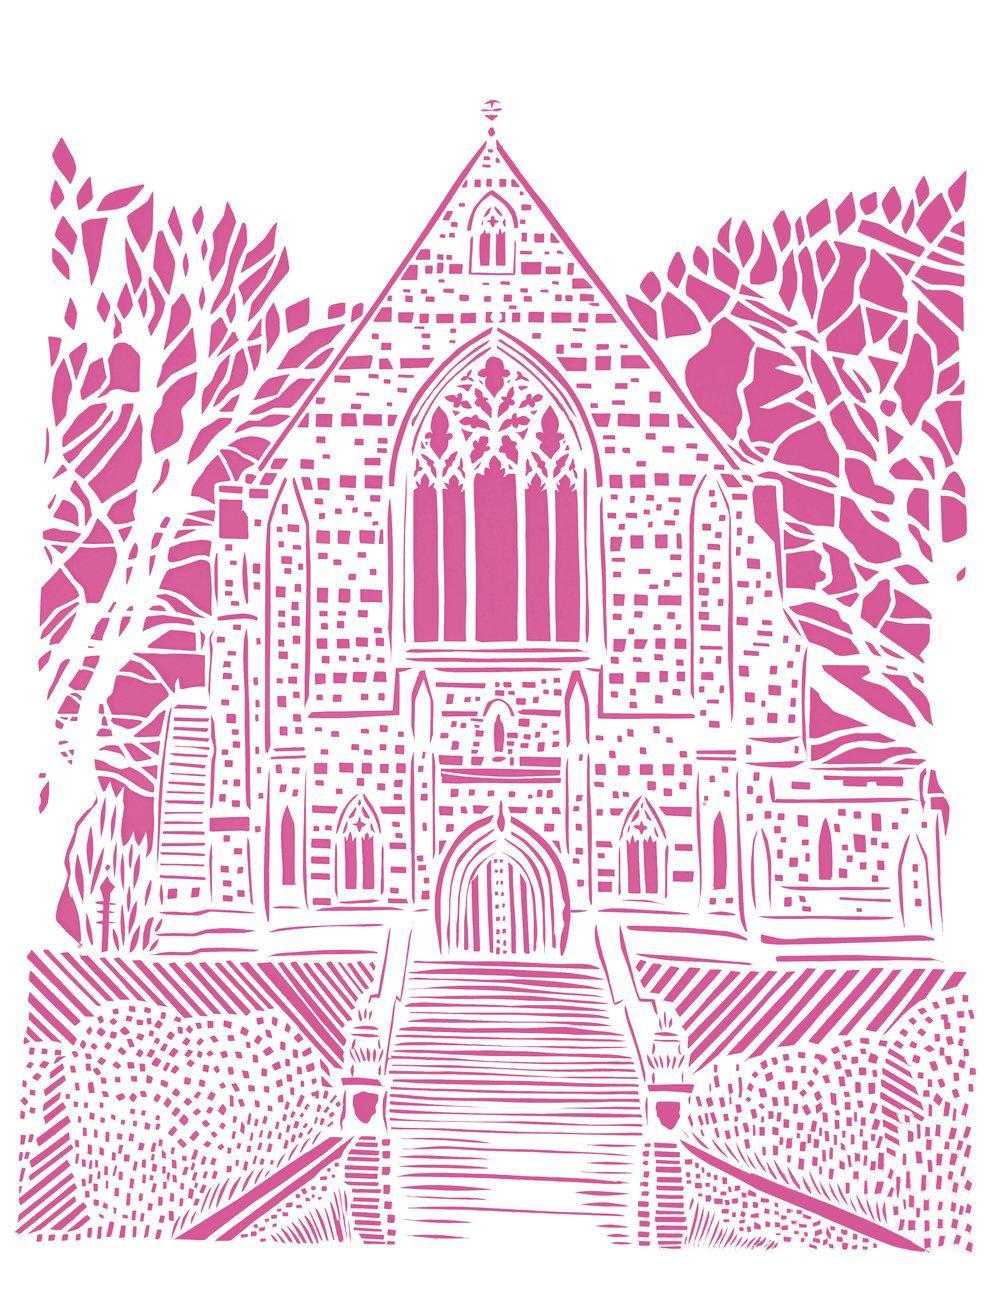 Marlborough College Chapel, pink and white papercut, 21.0 x 29.7cm